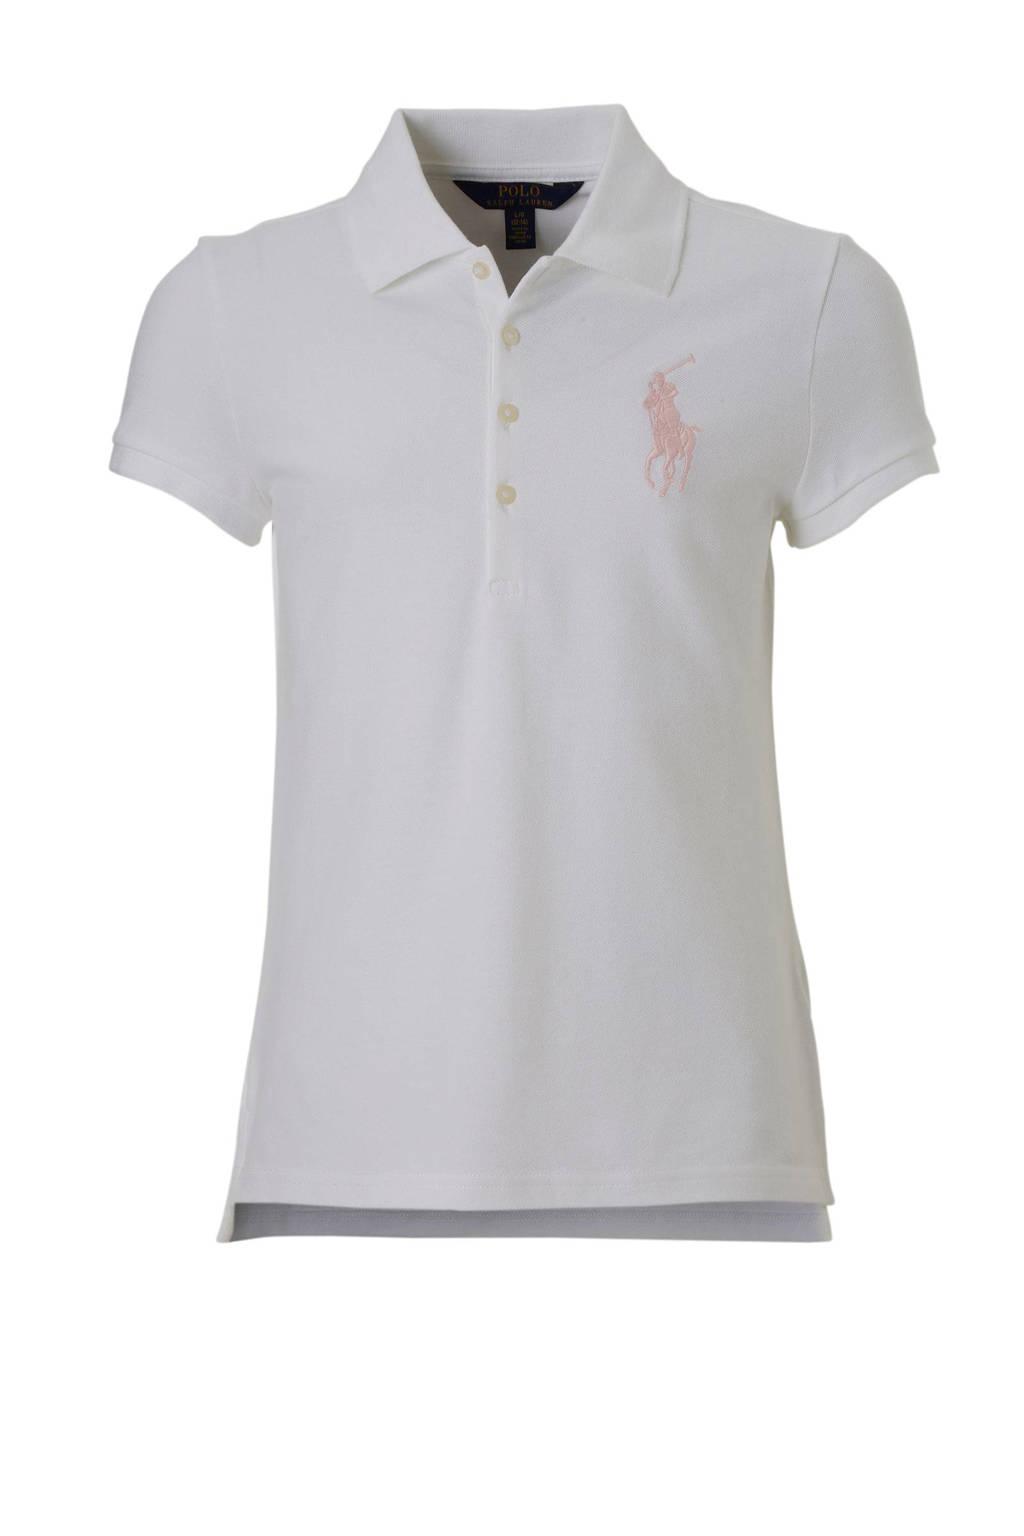 POLO Ralph Lauren polo met logo borduursel wit, Wit